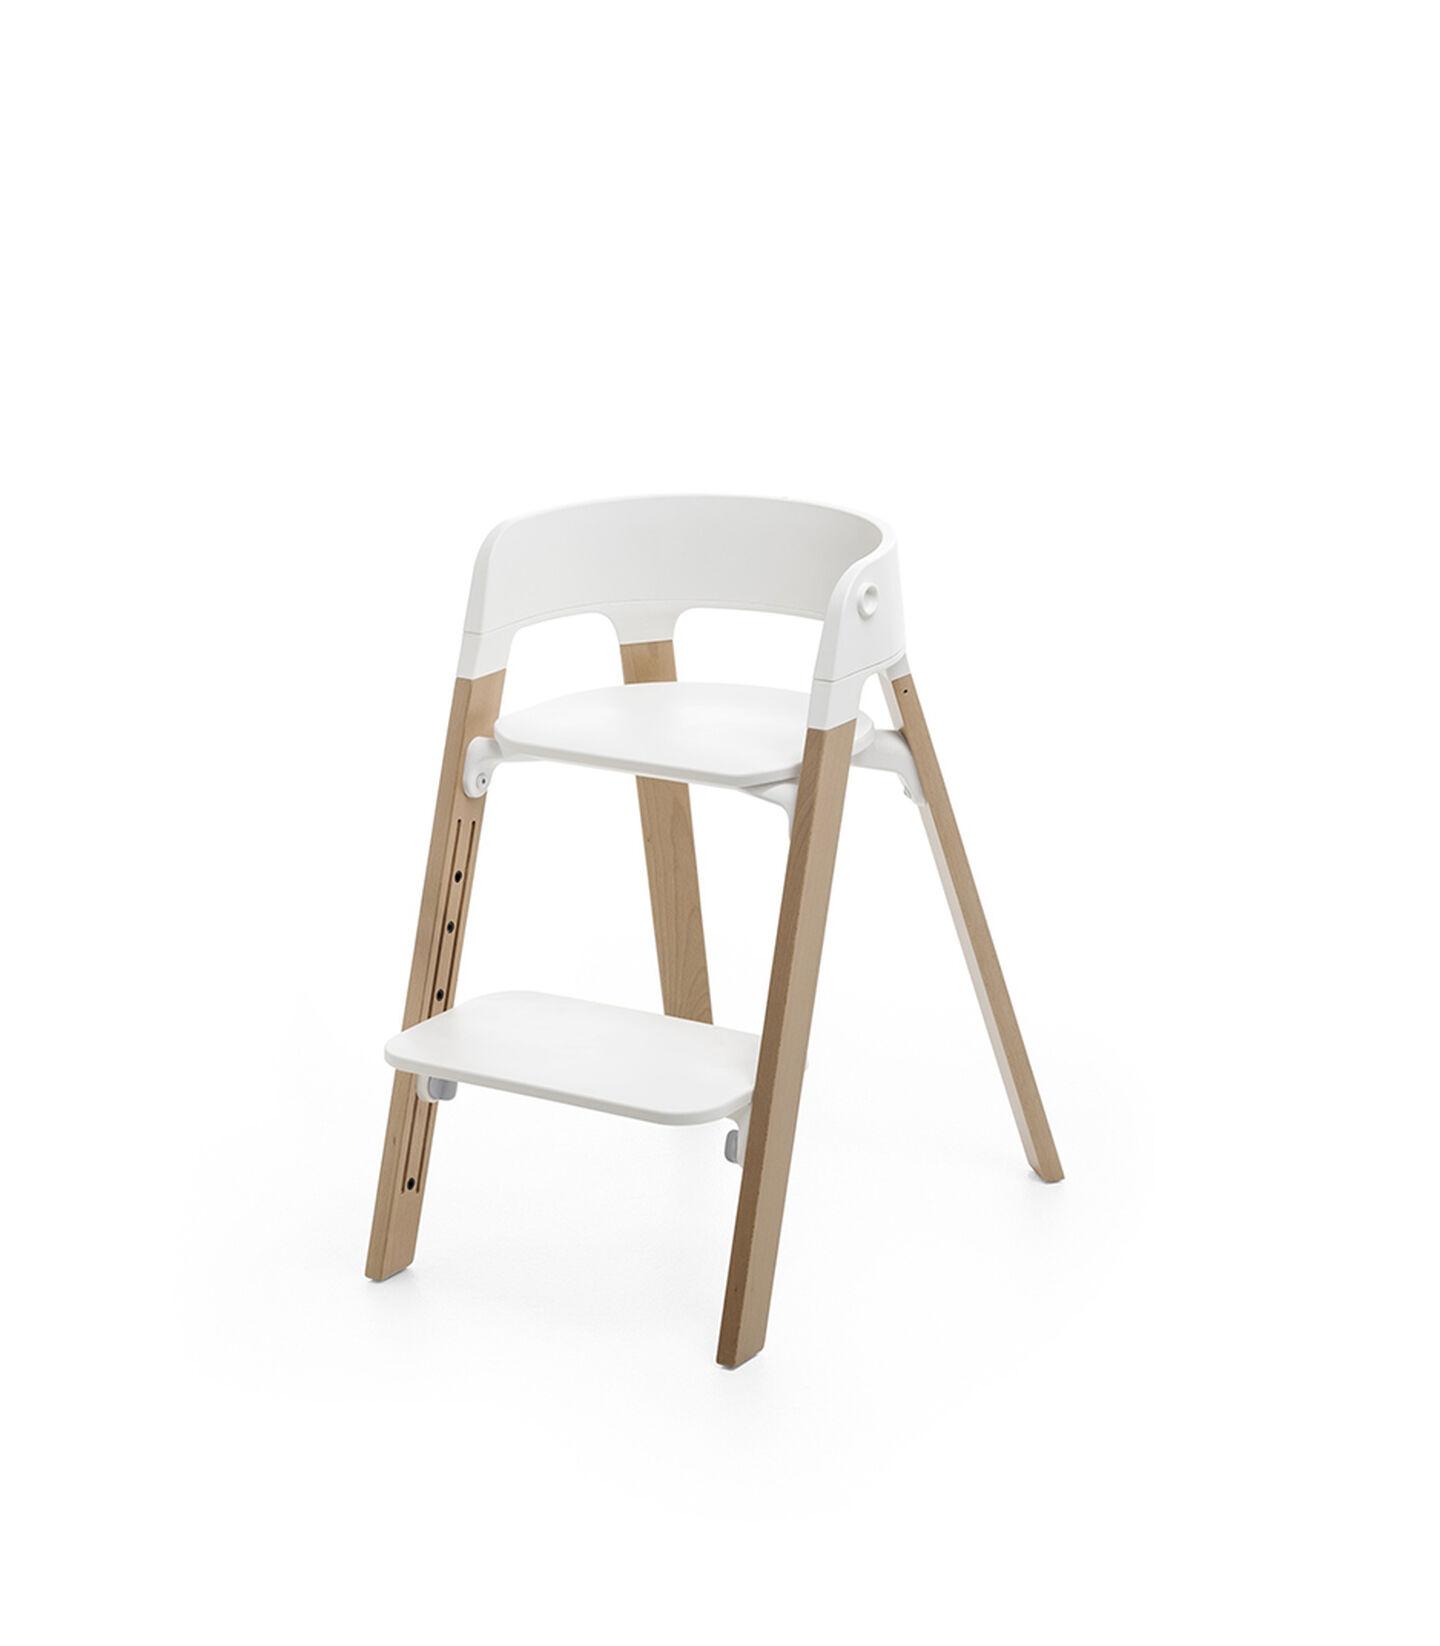 Stokke® Steps™ Chair White Oak, White/Oak Natural, mainview view 2